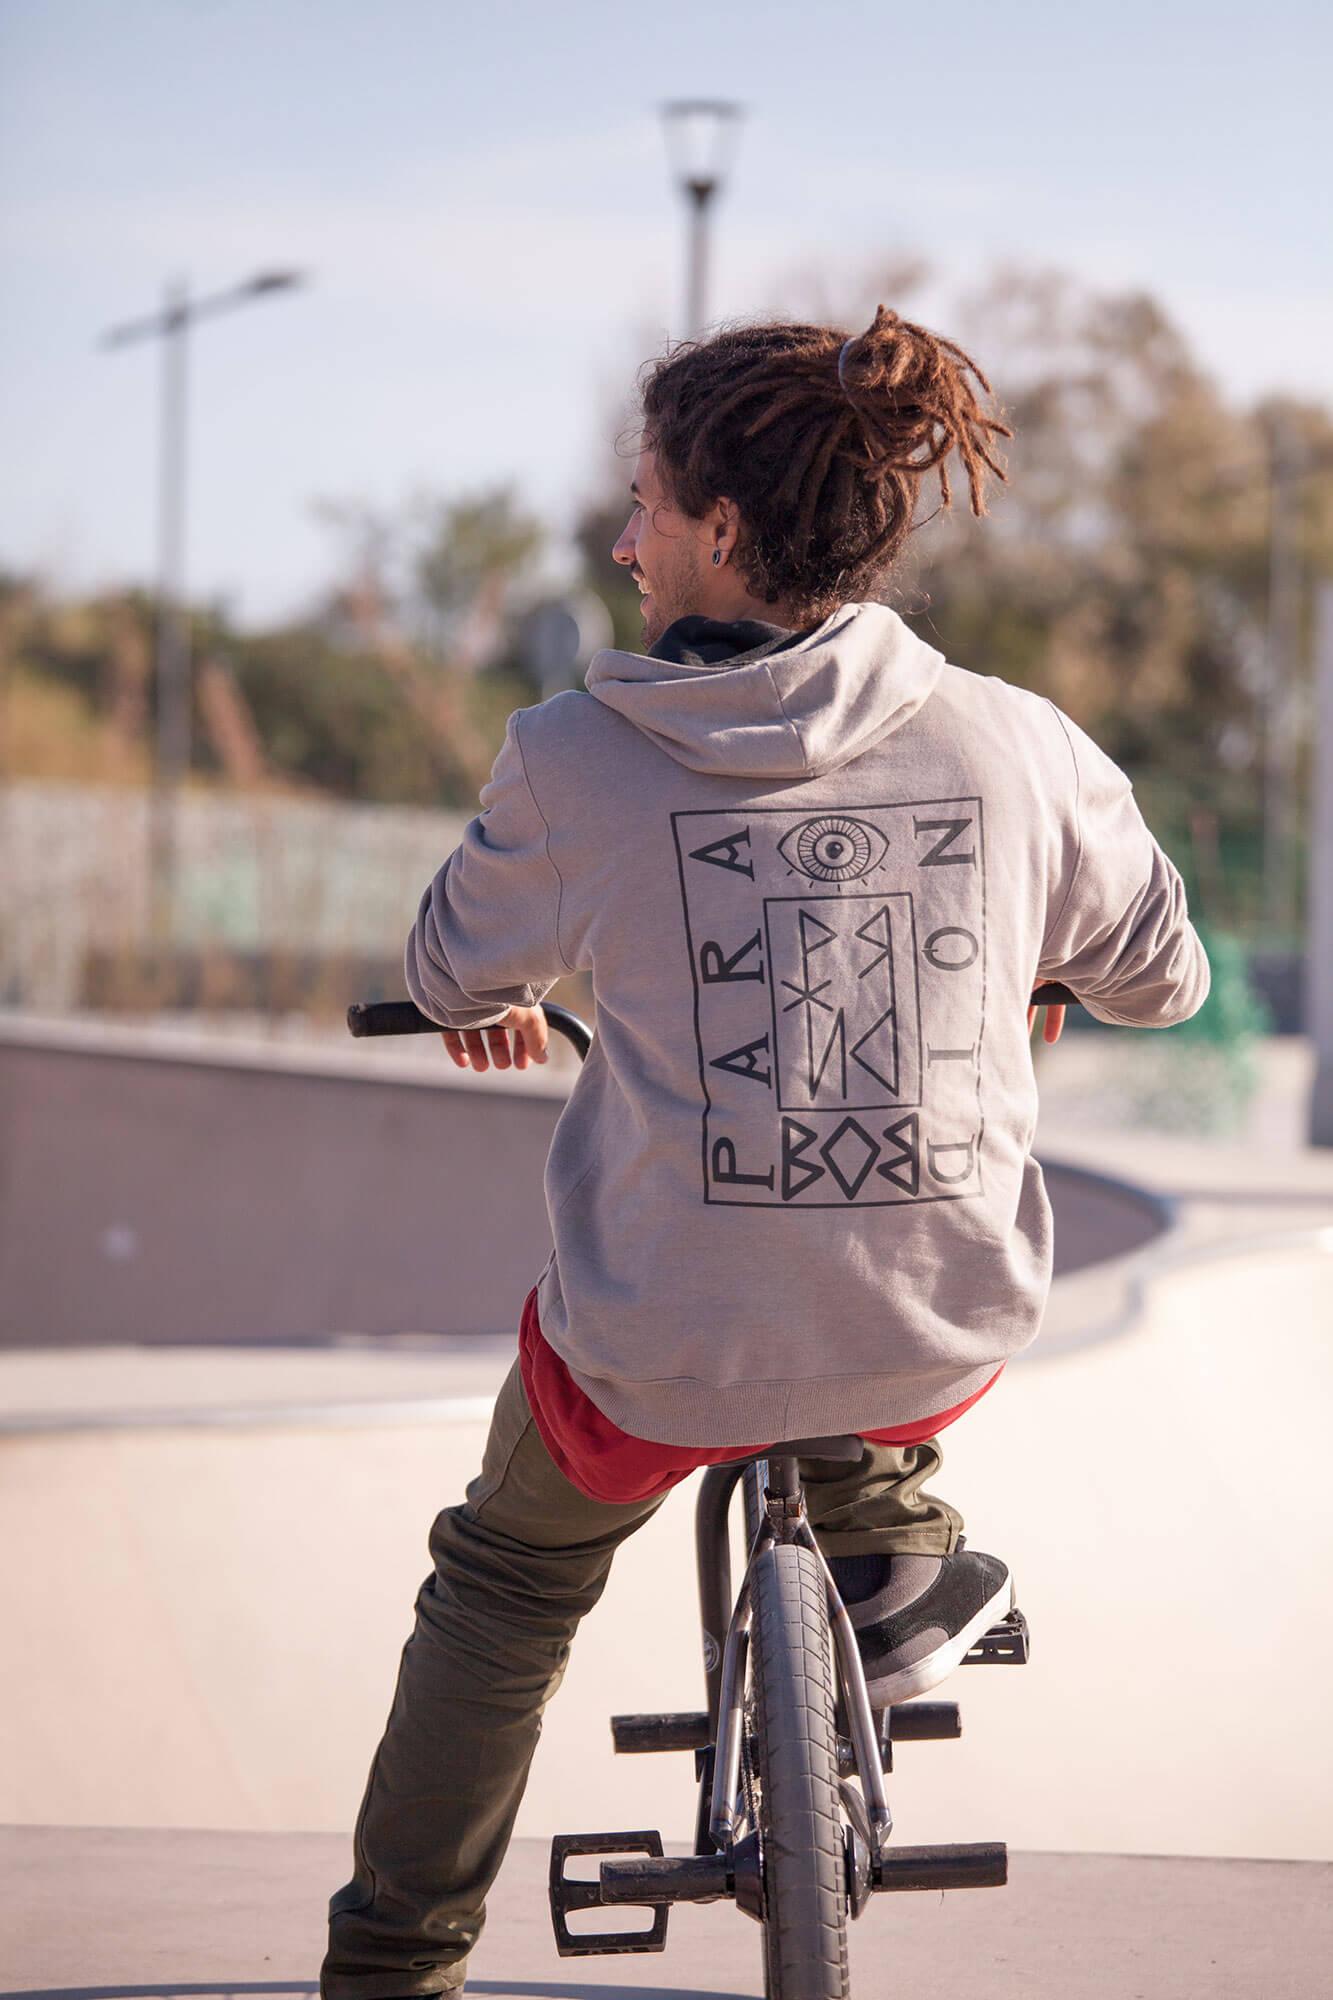 Piloto de Street BMX